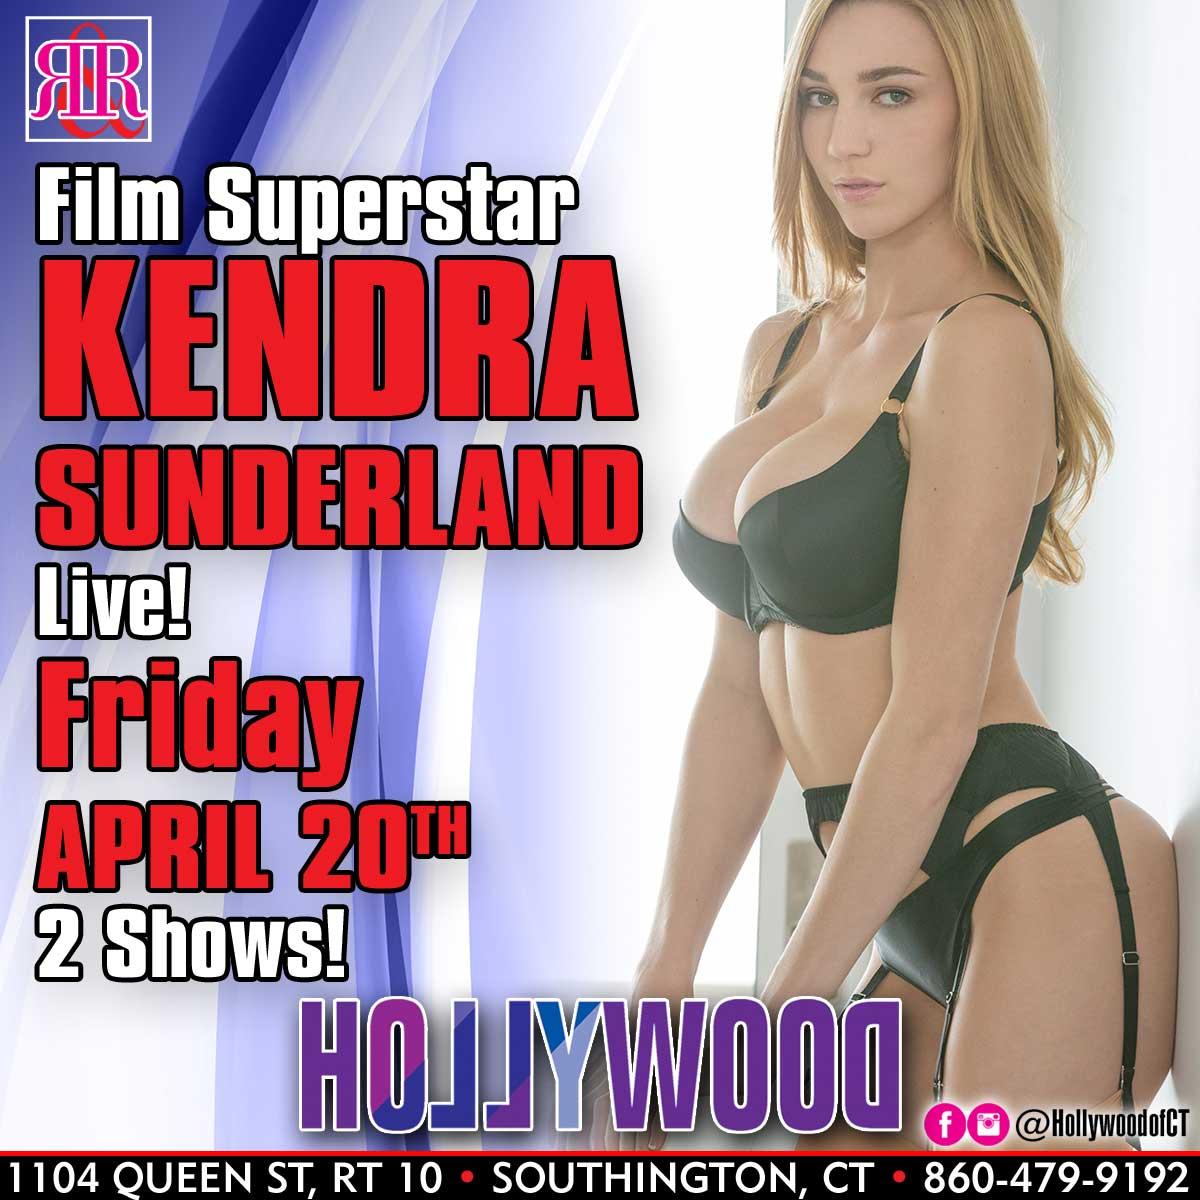 XXX Superstar Kendra Sunderland | Hollywood Strip Club Connecticut